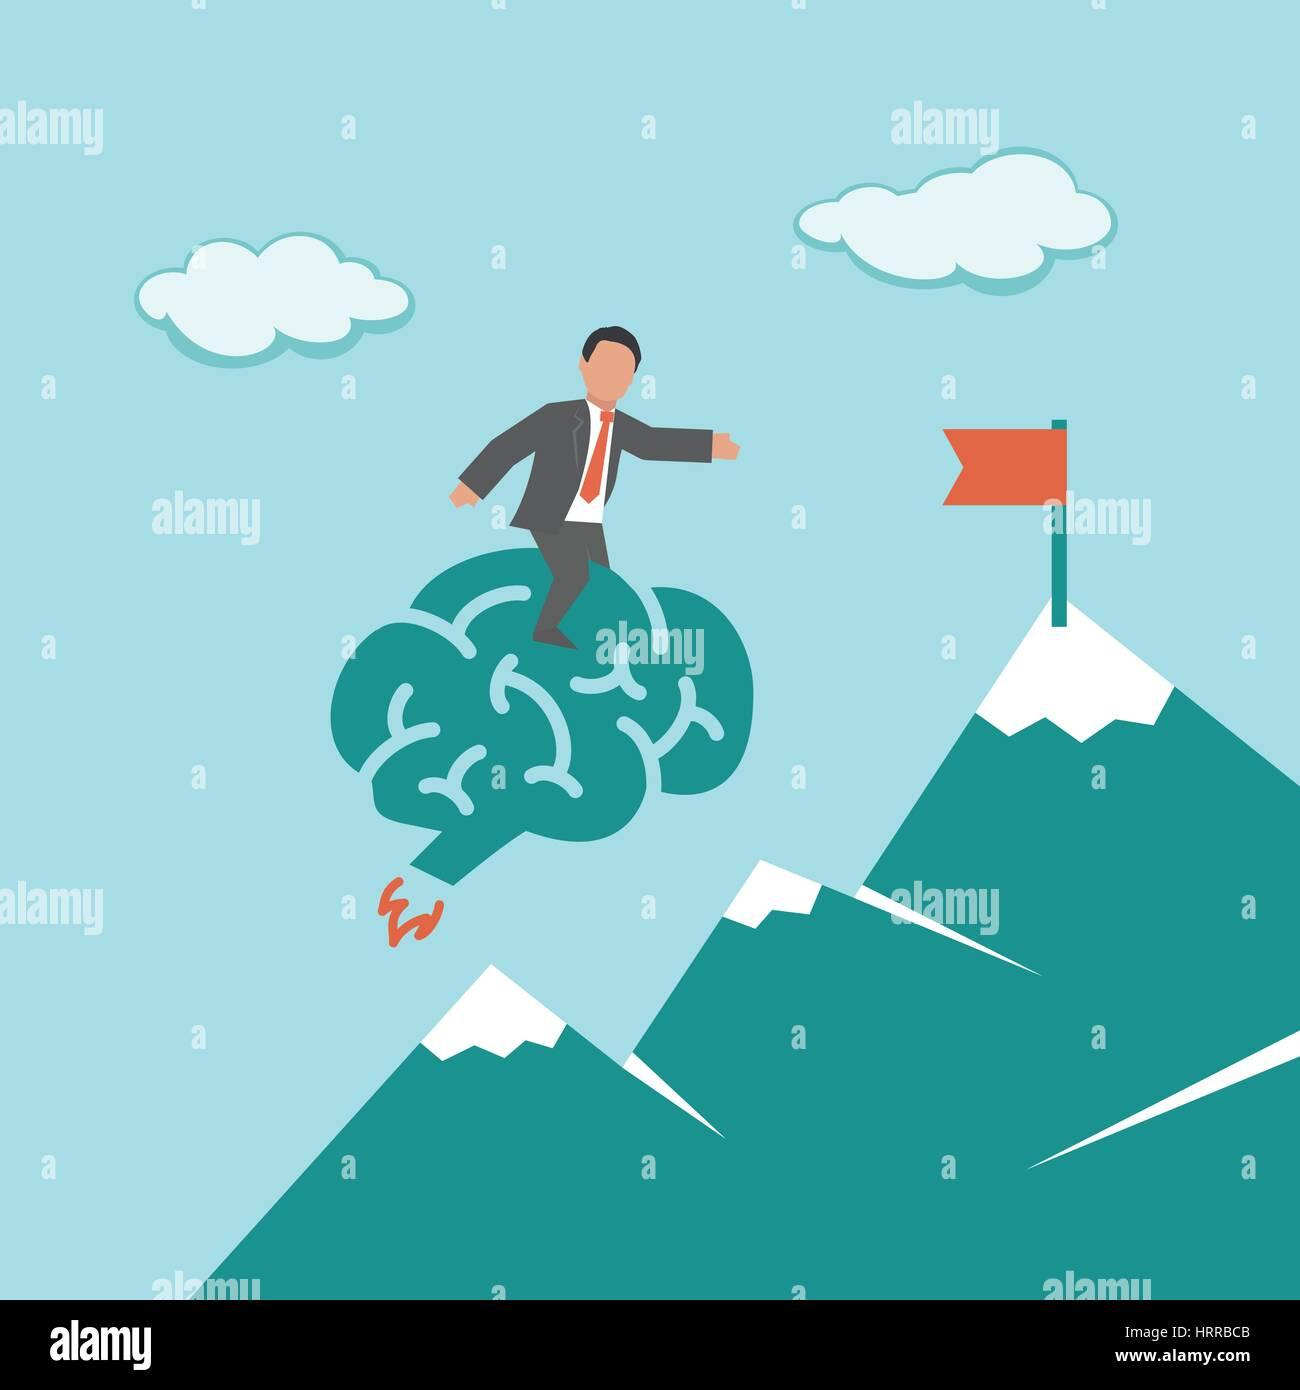 Smart Solution. Concept business illustration - Stock Image